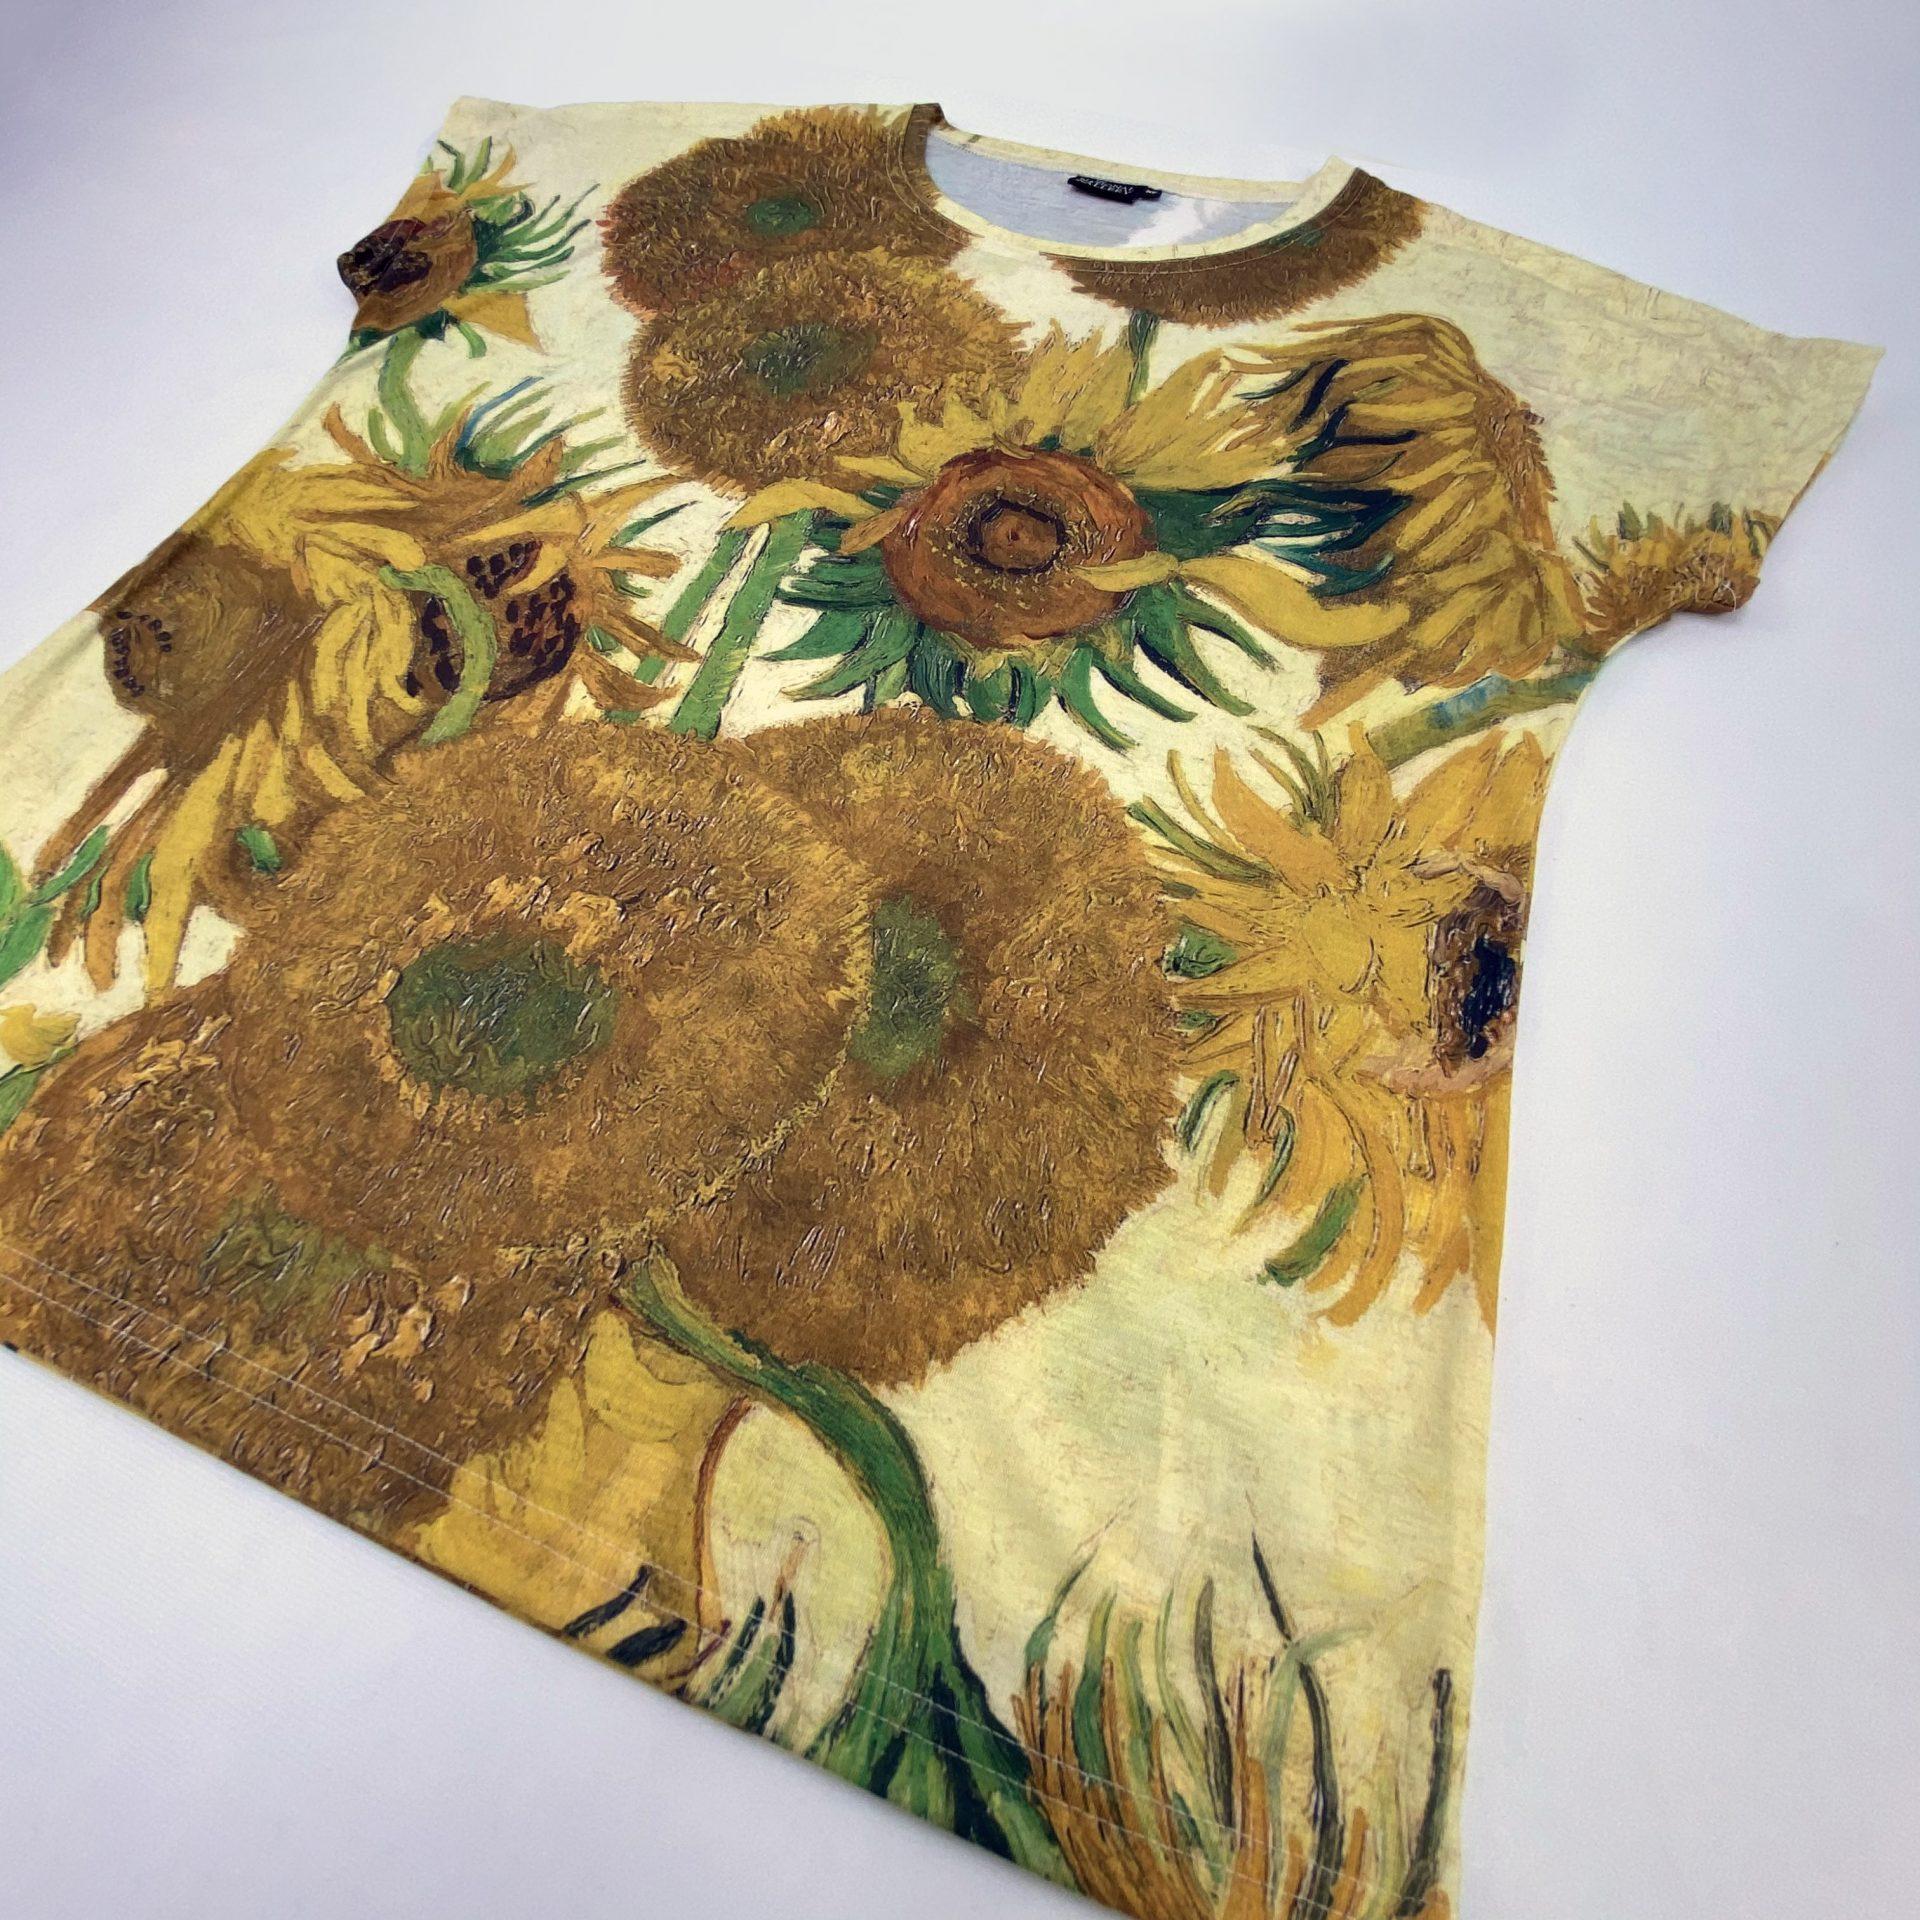 Van Gogh Recycled polyester Bespoke t-shirts